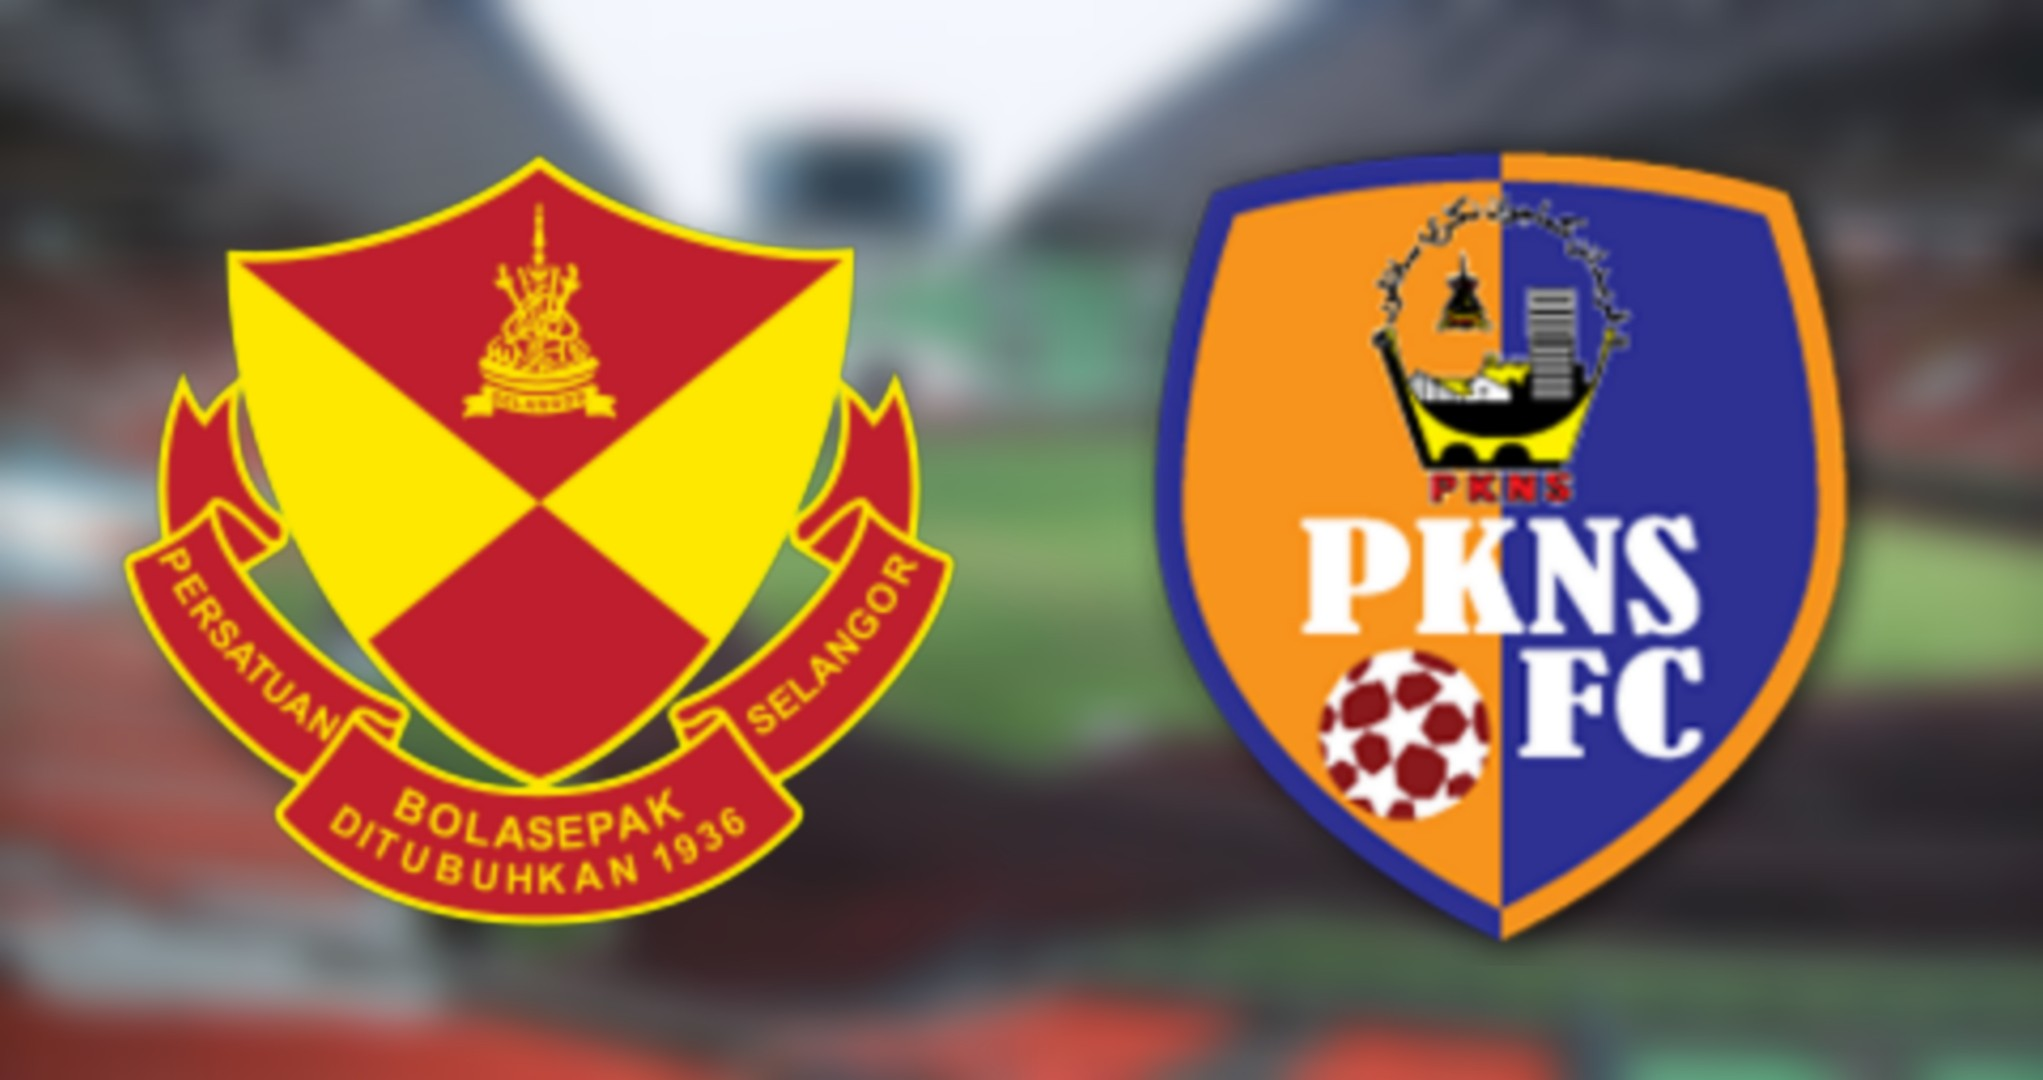 Live Streaming Selangor vs PKNS FC 17.2.2019 Liga Super